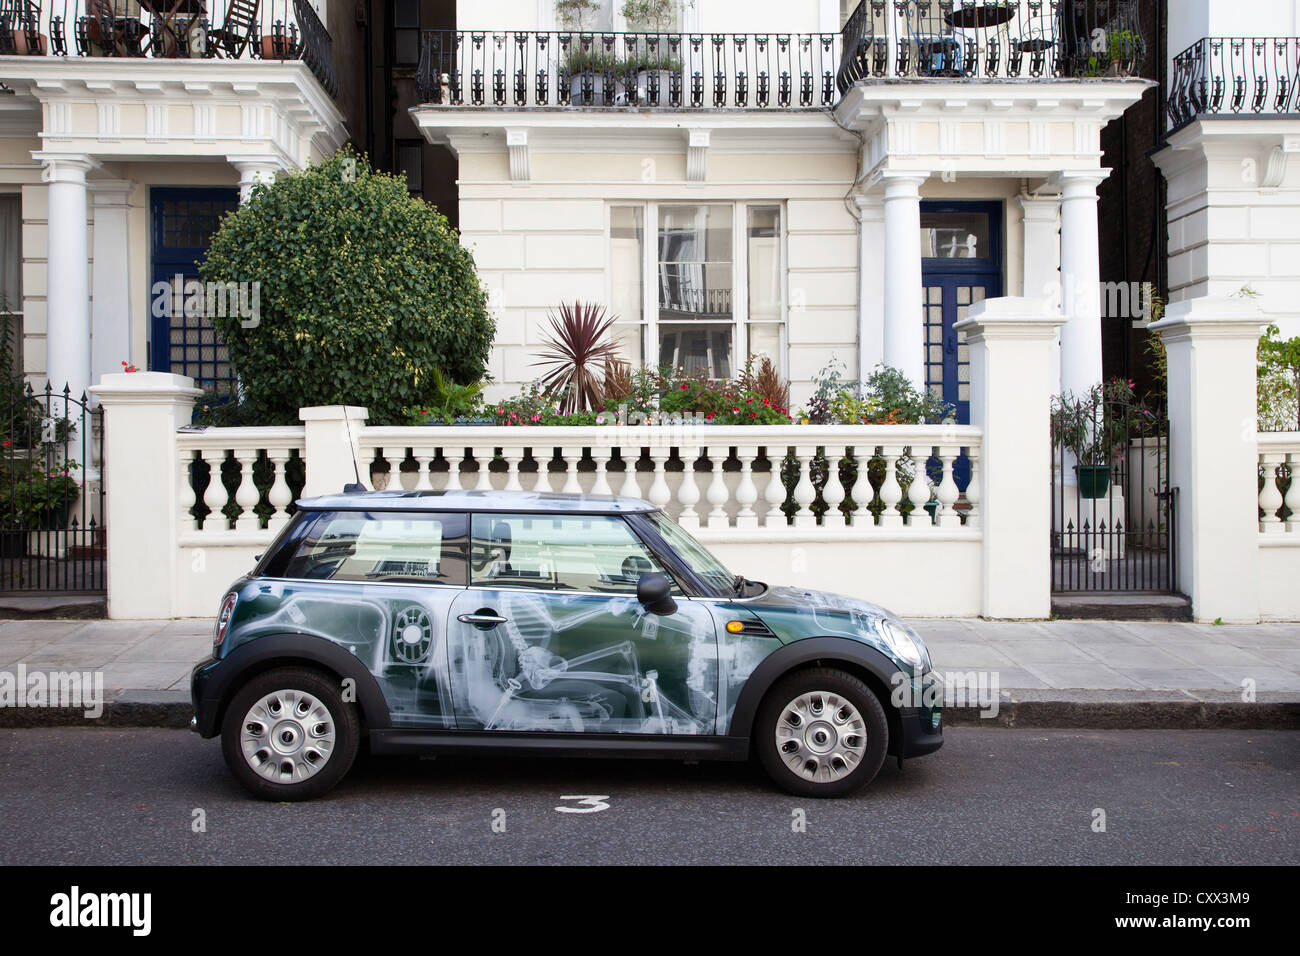 Mini coche en frente de la residencia londinense. Imagen De Stock